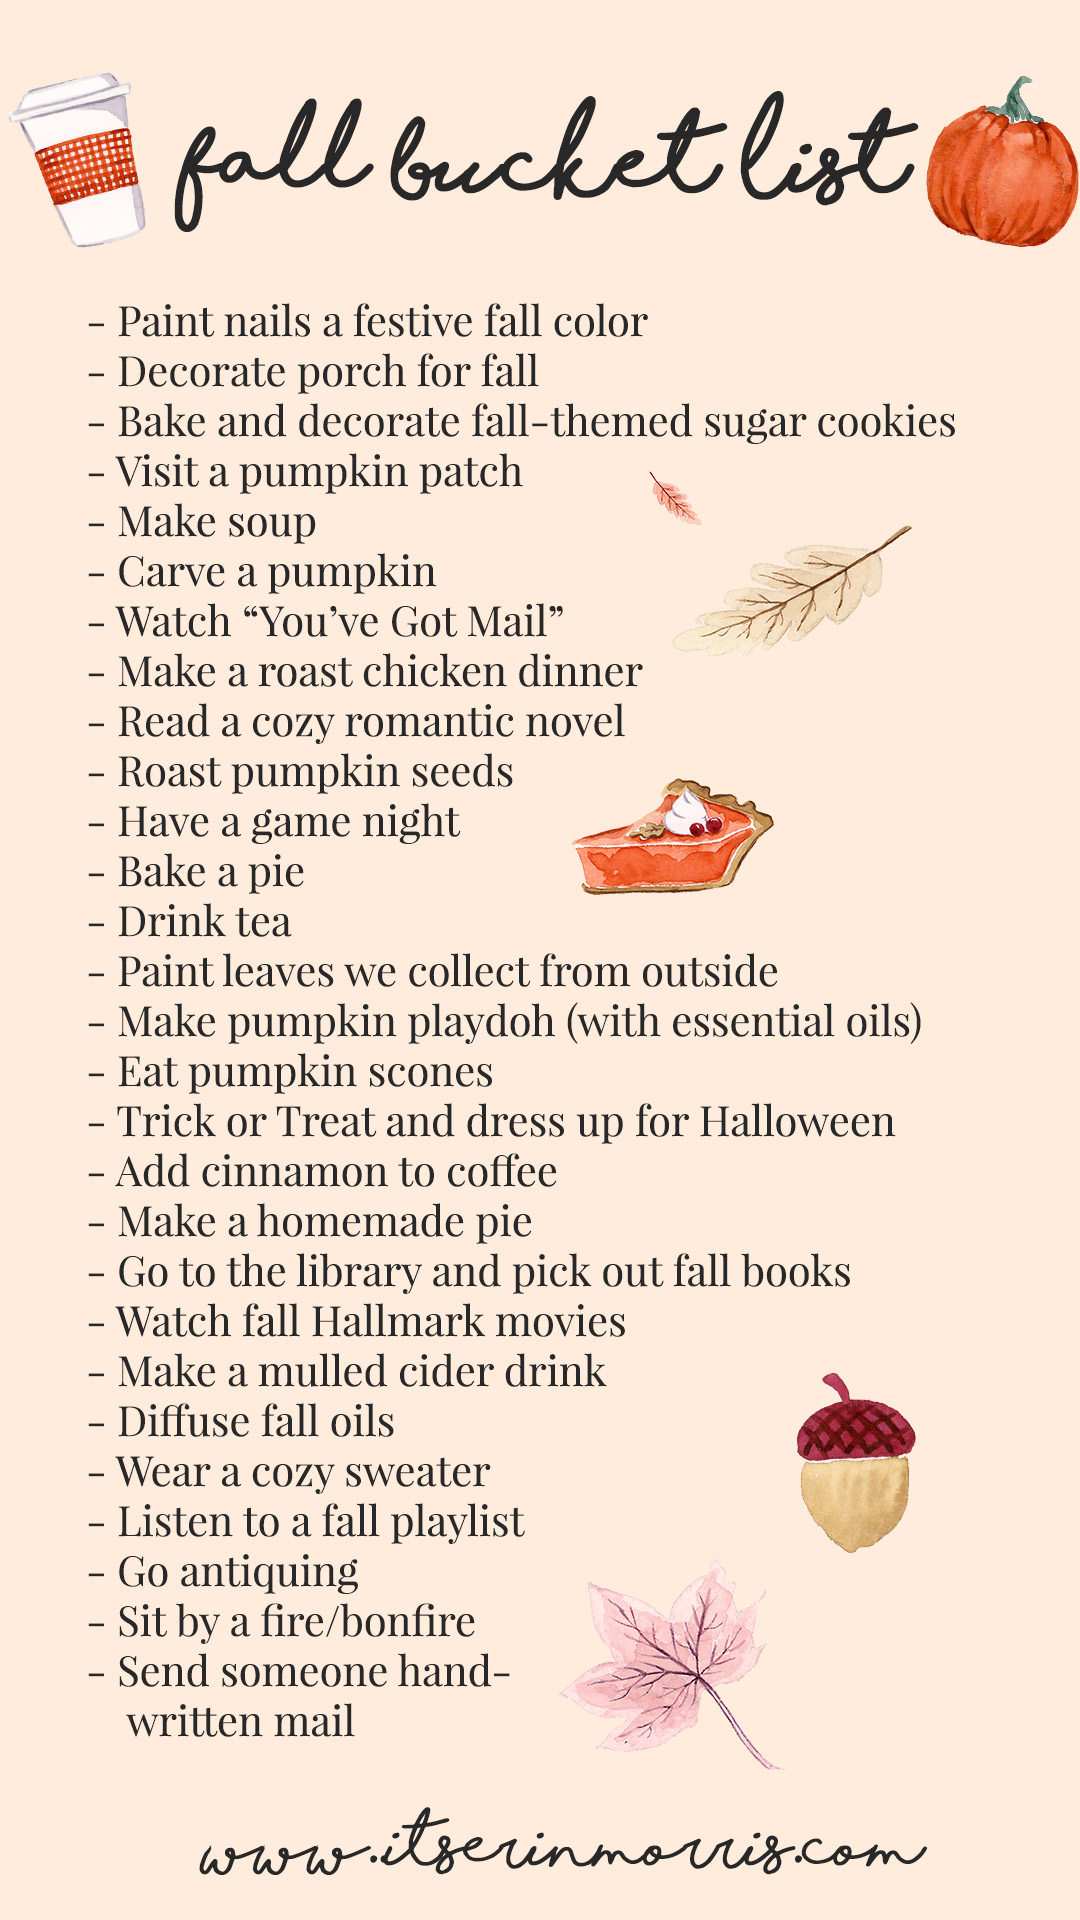 fall bucket list.jpg